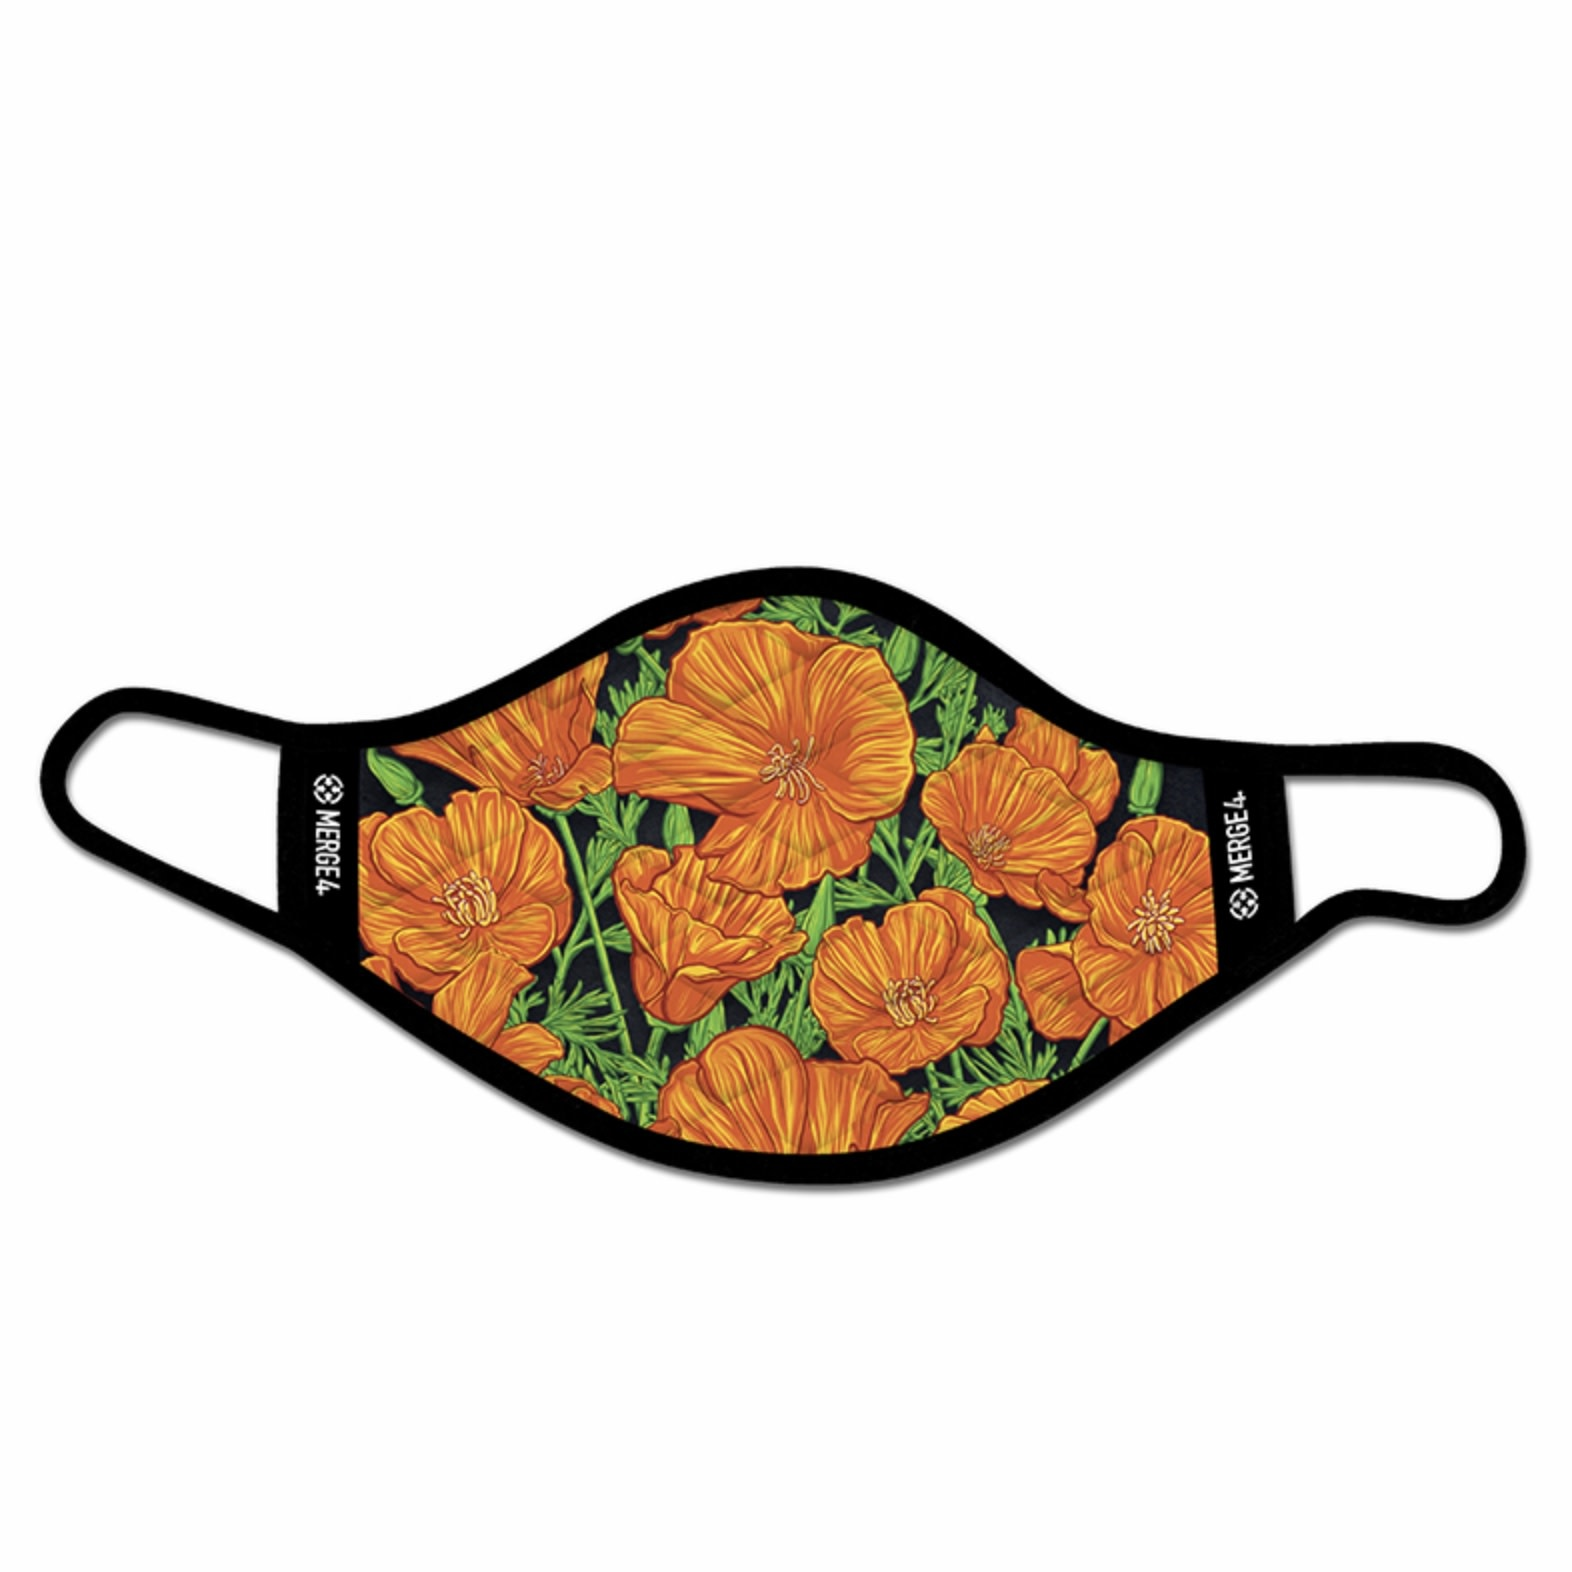 Merge 4 Merge 4 -Slogan Poppies Mask